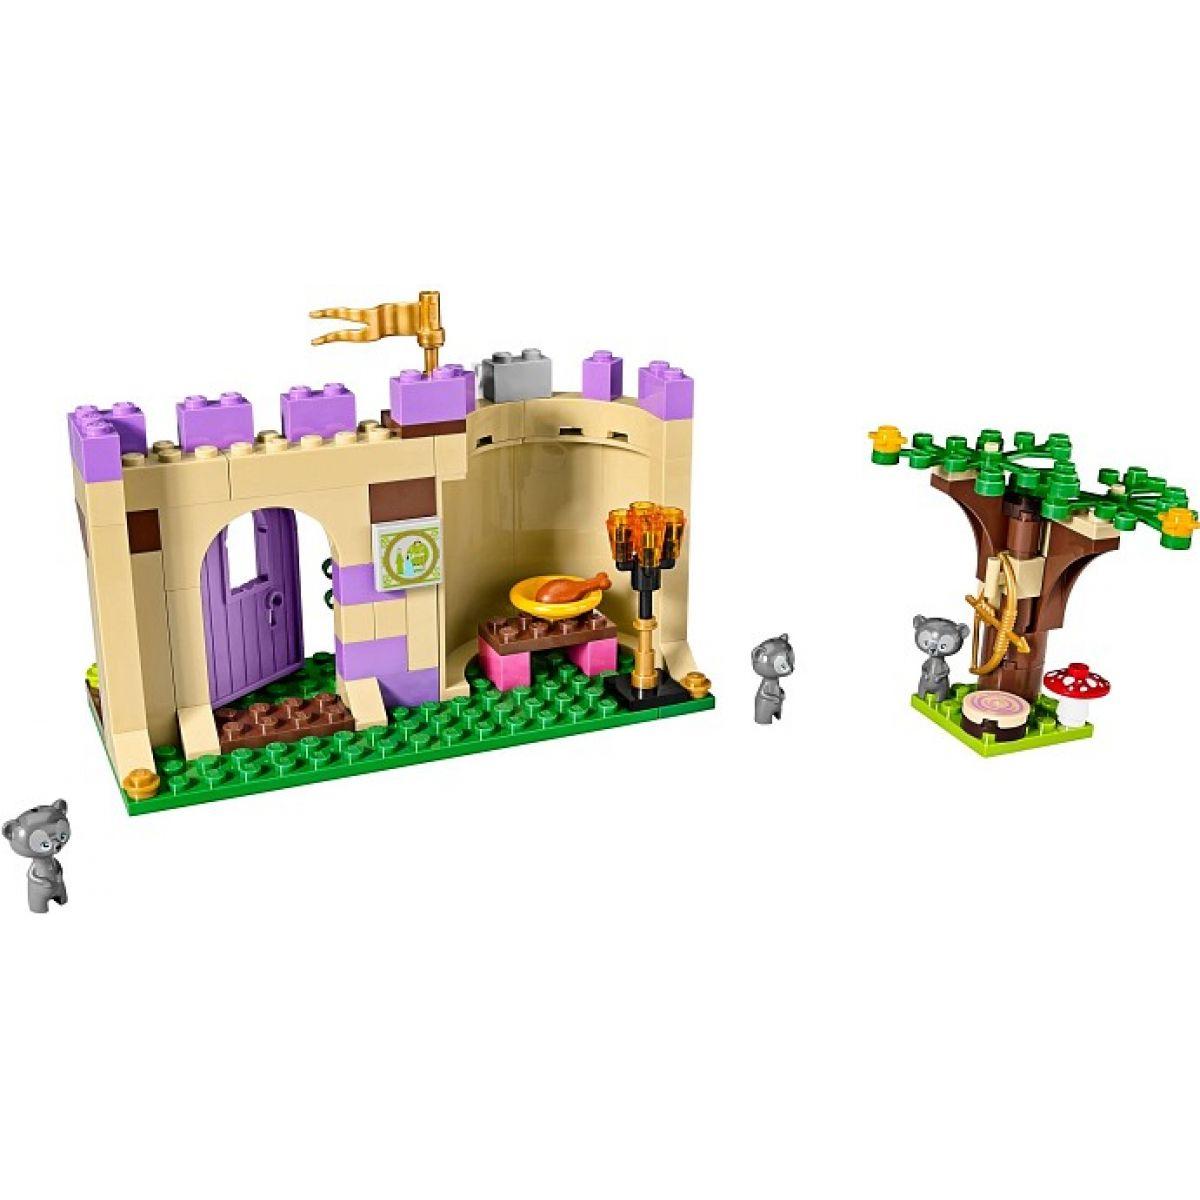 LEGO Disney Princess 41051 Hry princezny Meridy #3